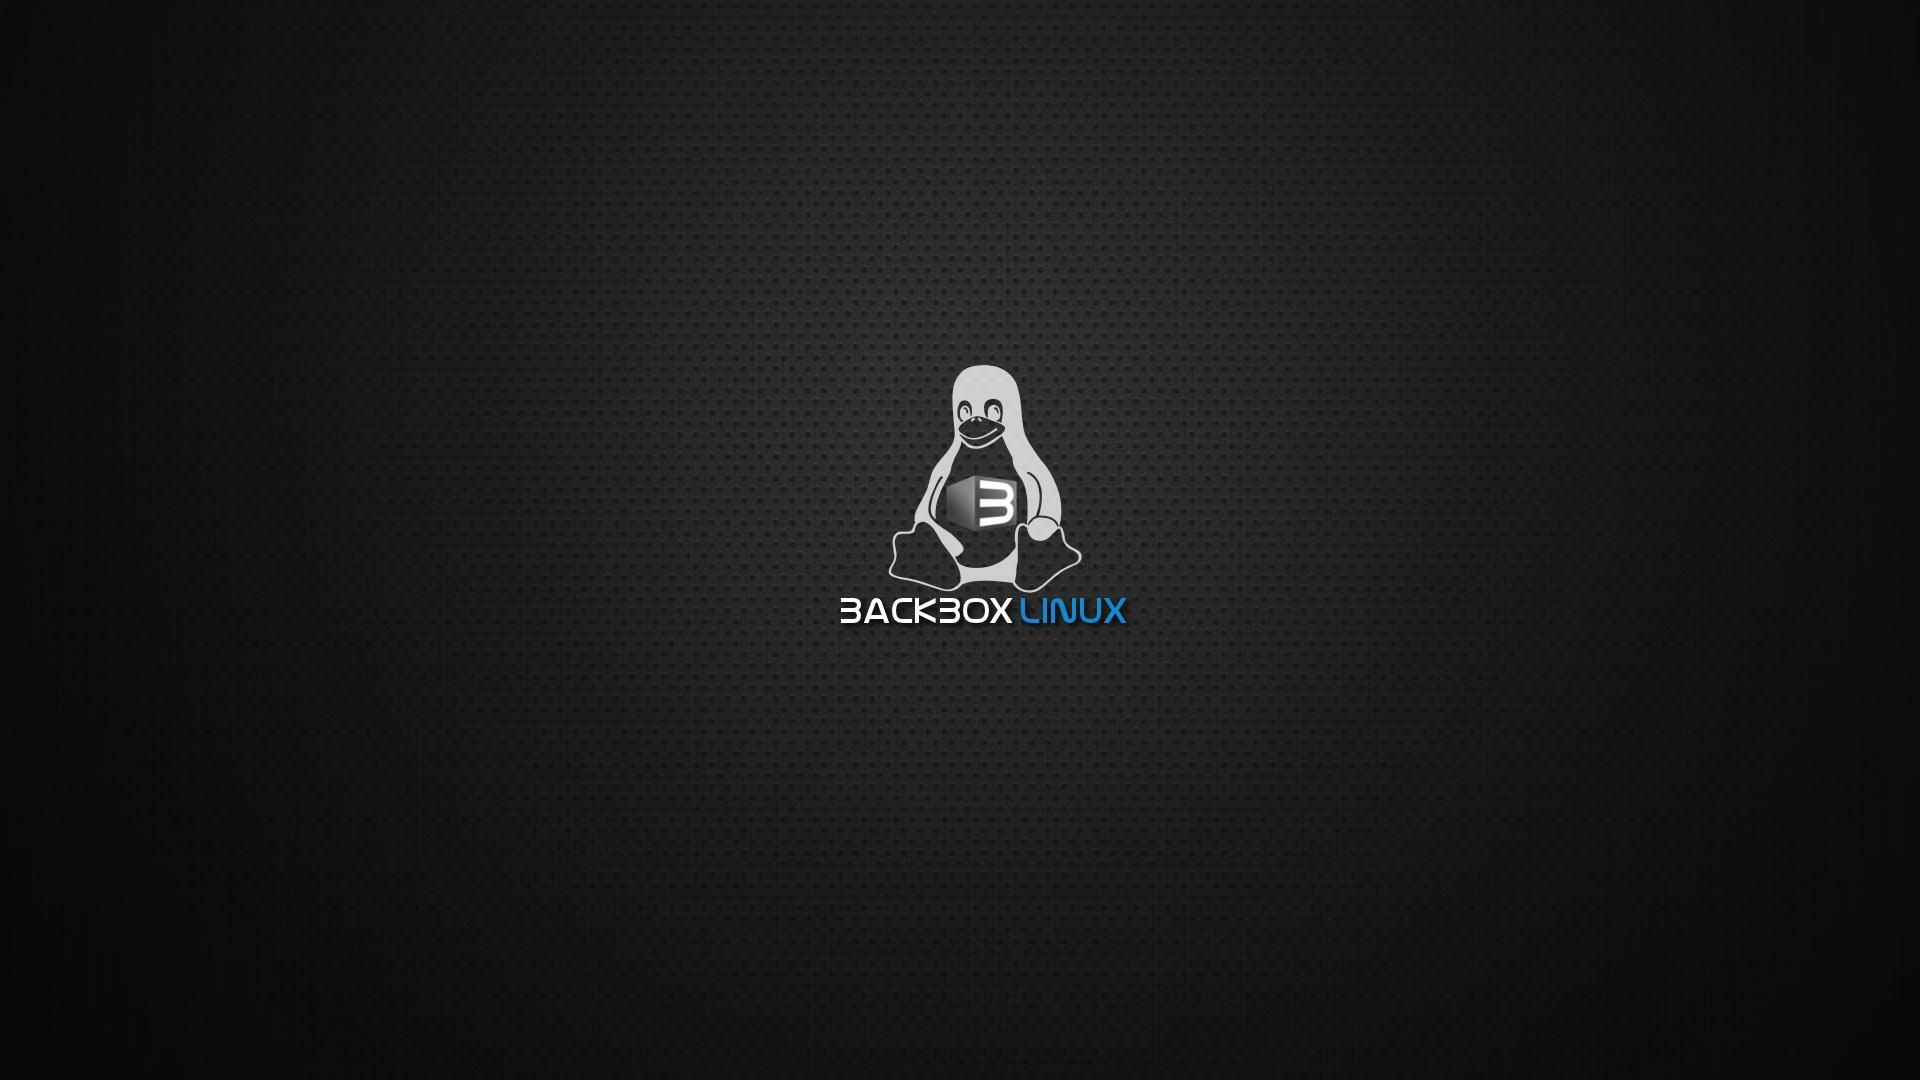 Backbox linux 40 linux pinterest linux backbox linux 40 baditri Image collections